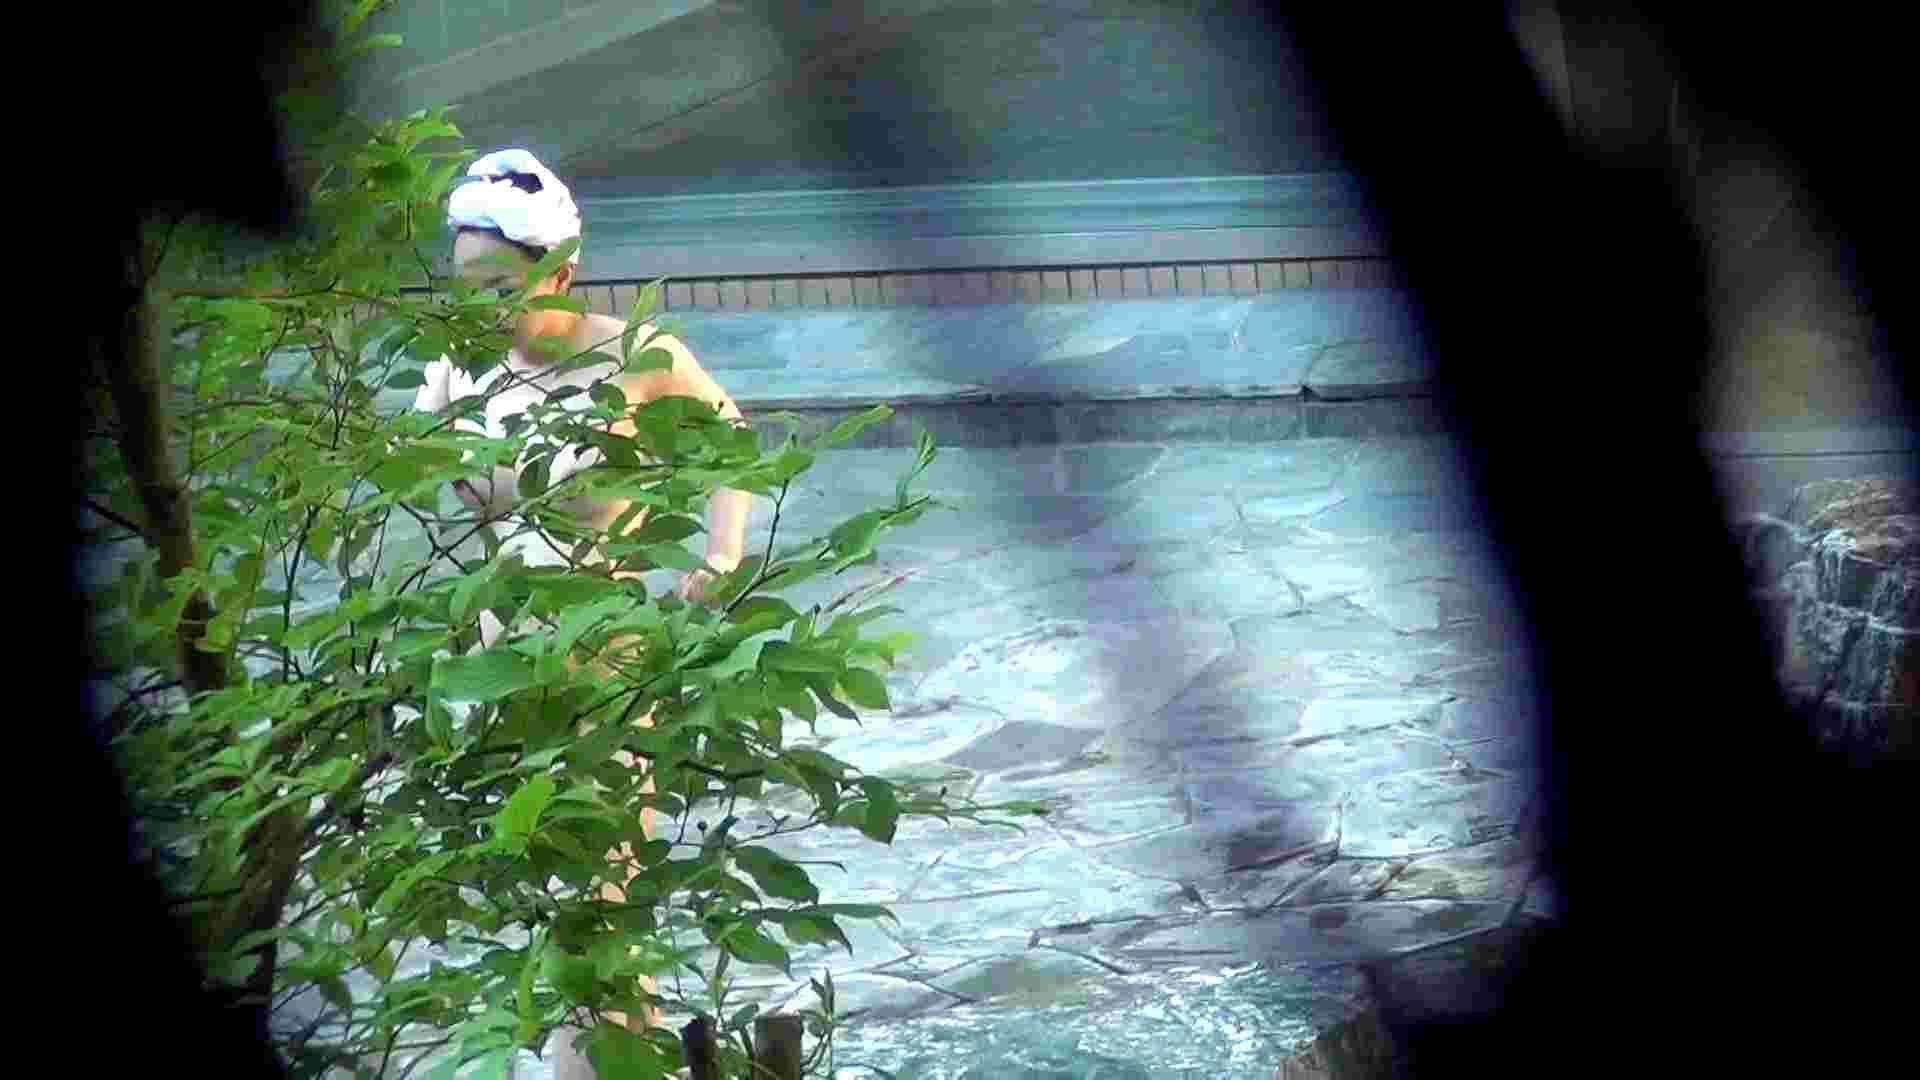 Aquaな露天風呂Vol.279 OLセックス 覗きオメコ動画キャプチャ 77画像 11